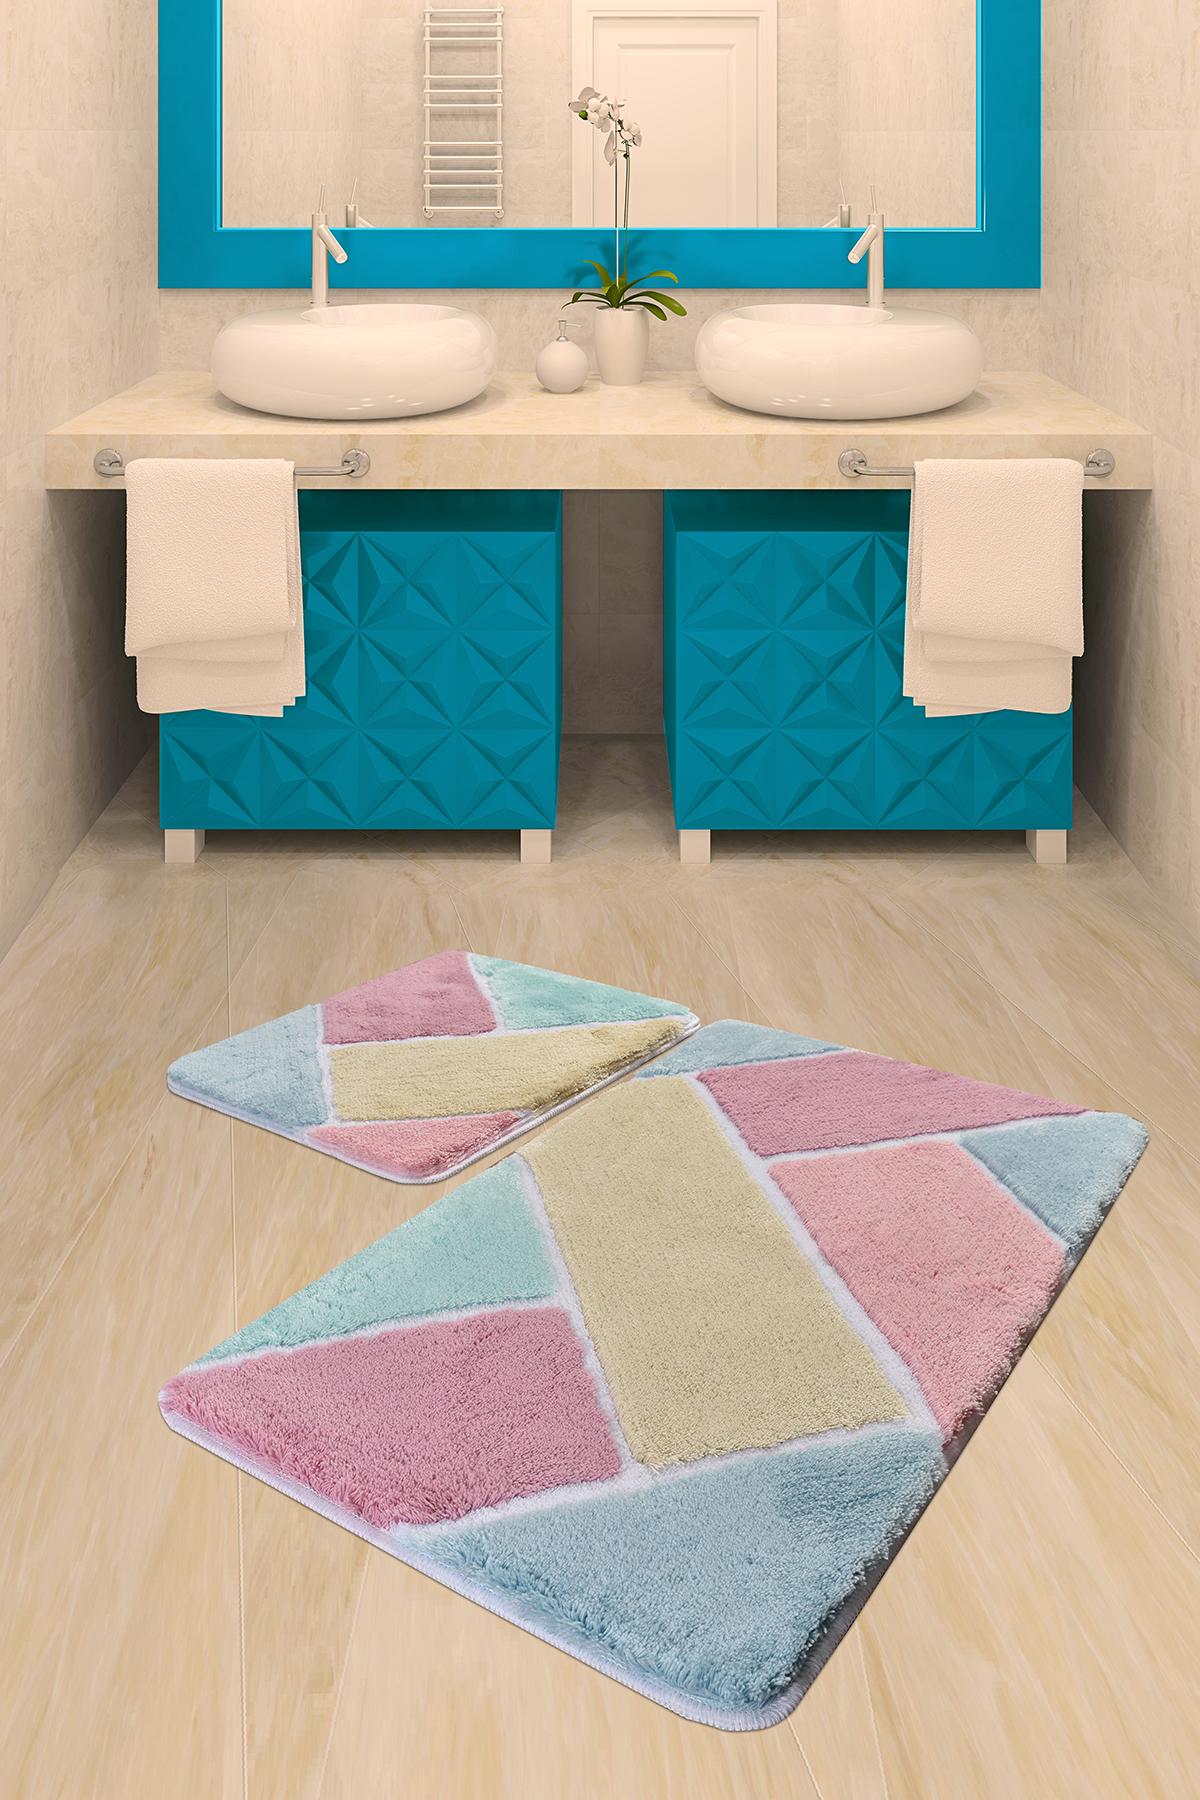 Коврик для ванной DO&CO (60Х100 см/50x60 см) COLORE